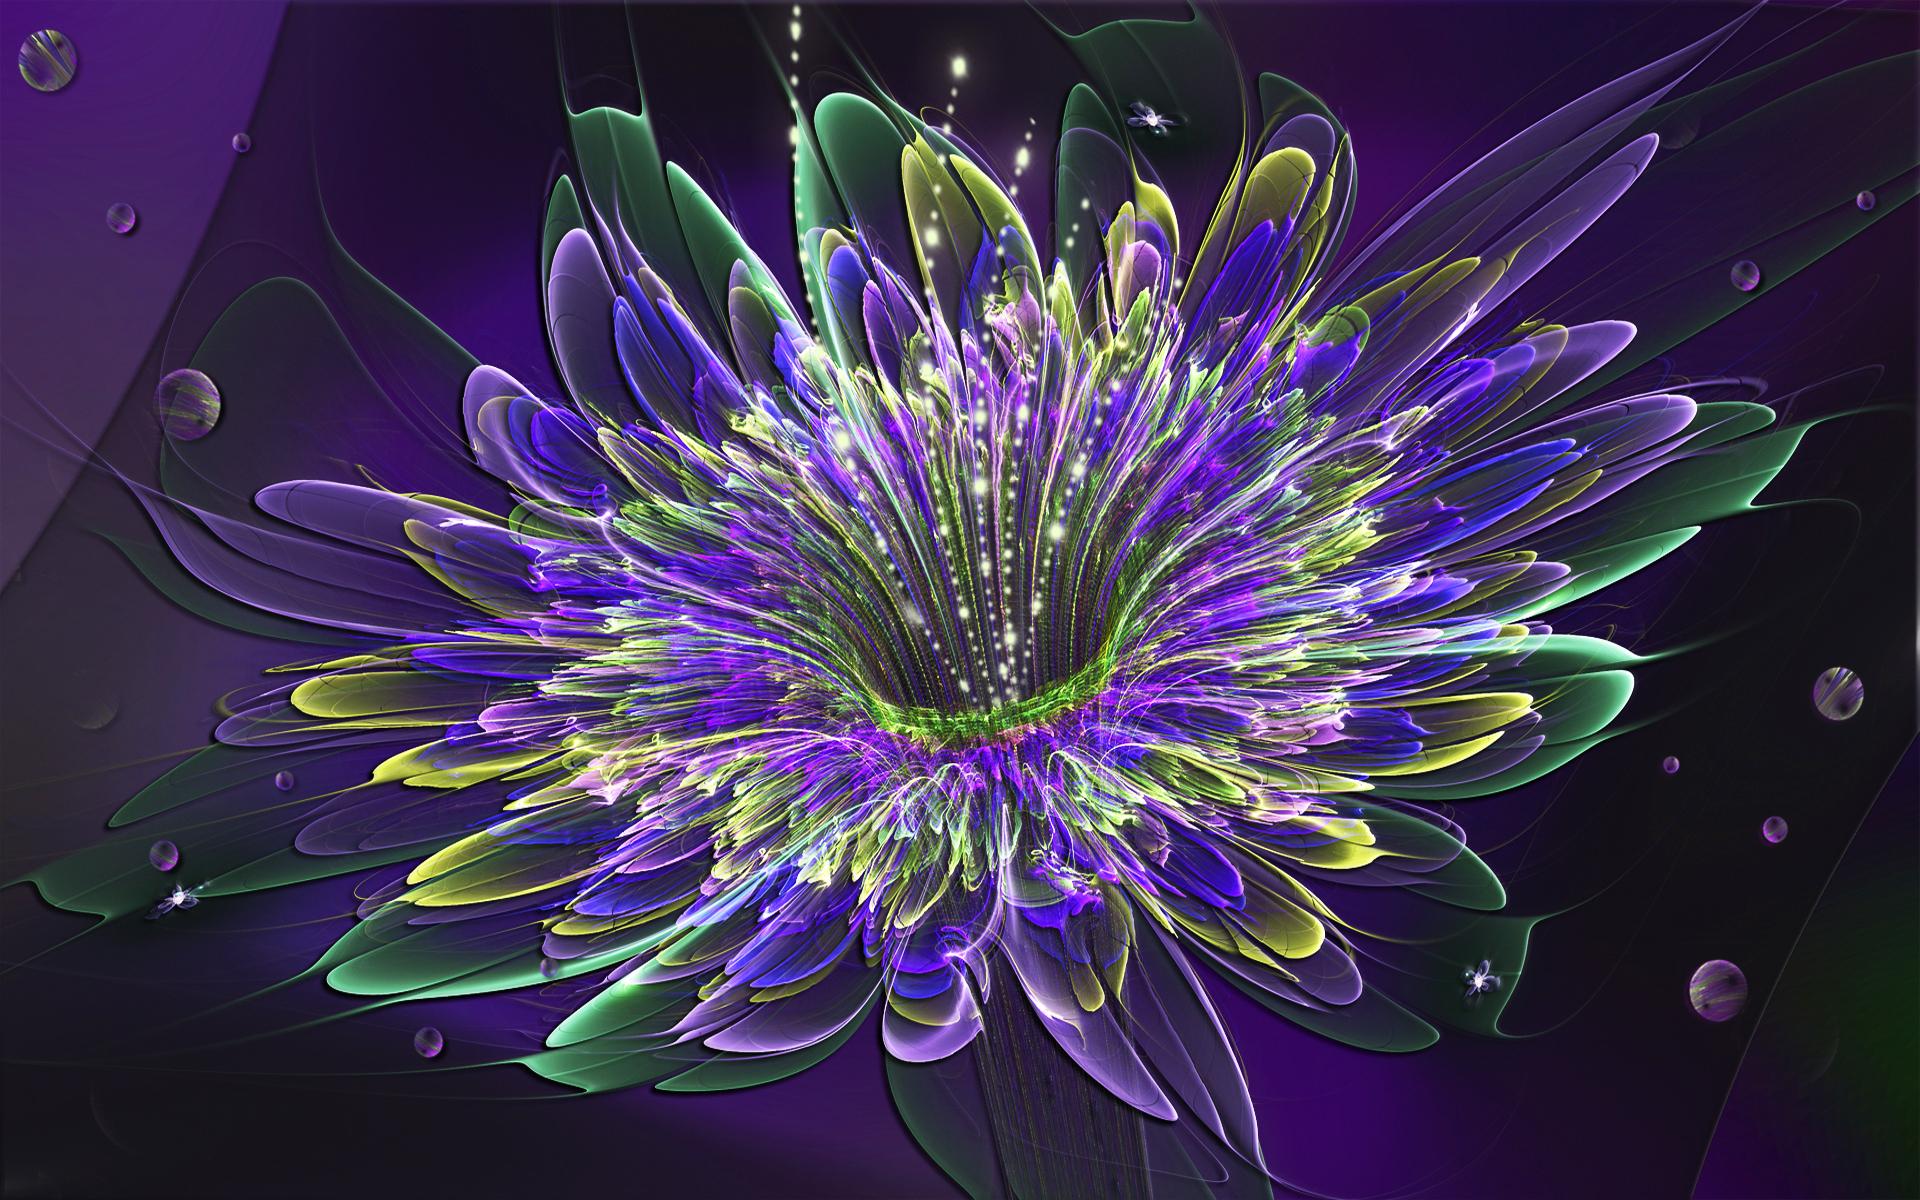 графика космос цветы роза graphics space flowers rose  № 927124 без смс